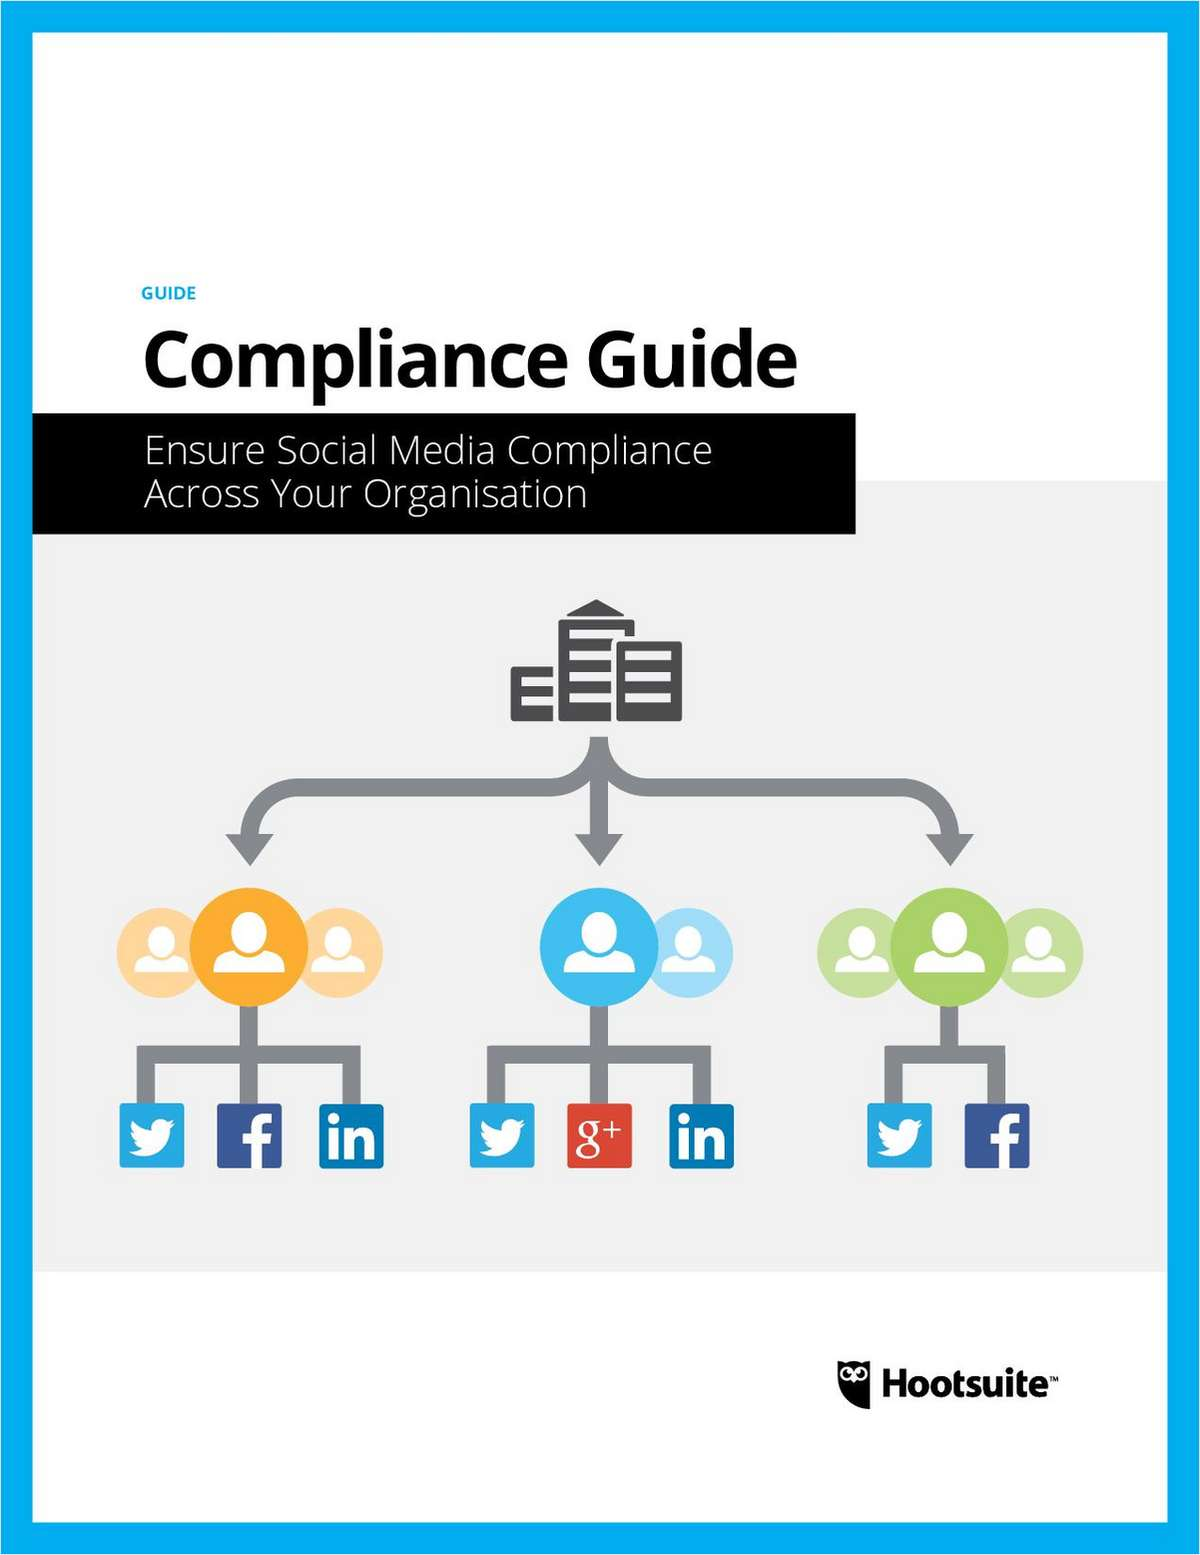 Ensure Social Media Compliance Across Your Organisation